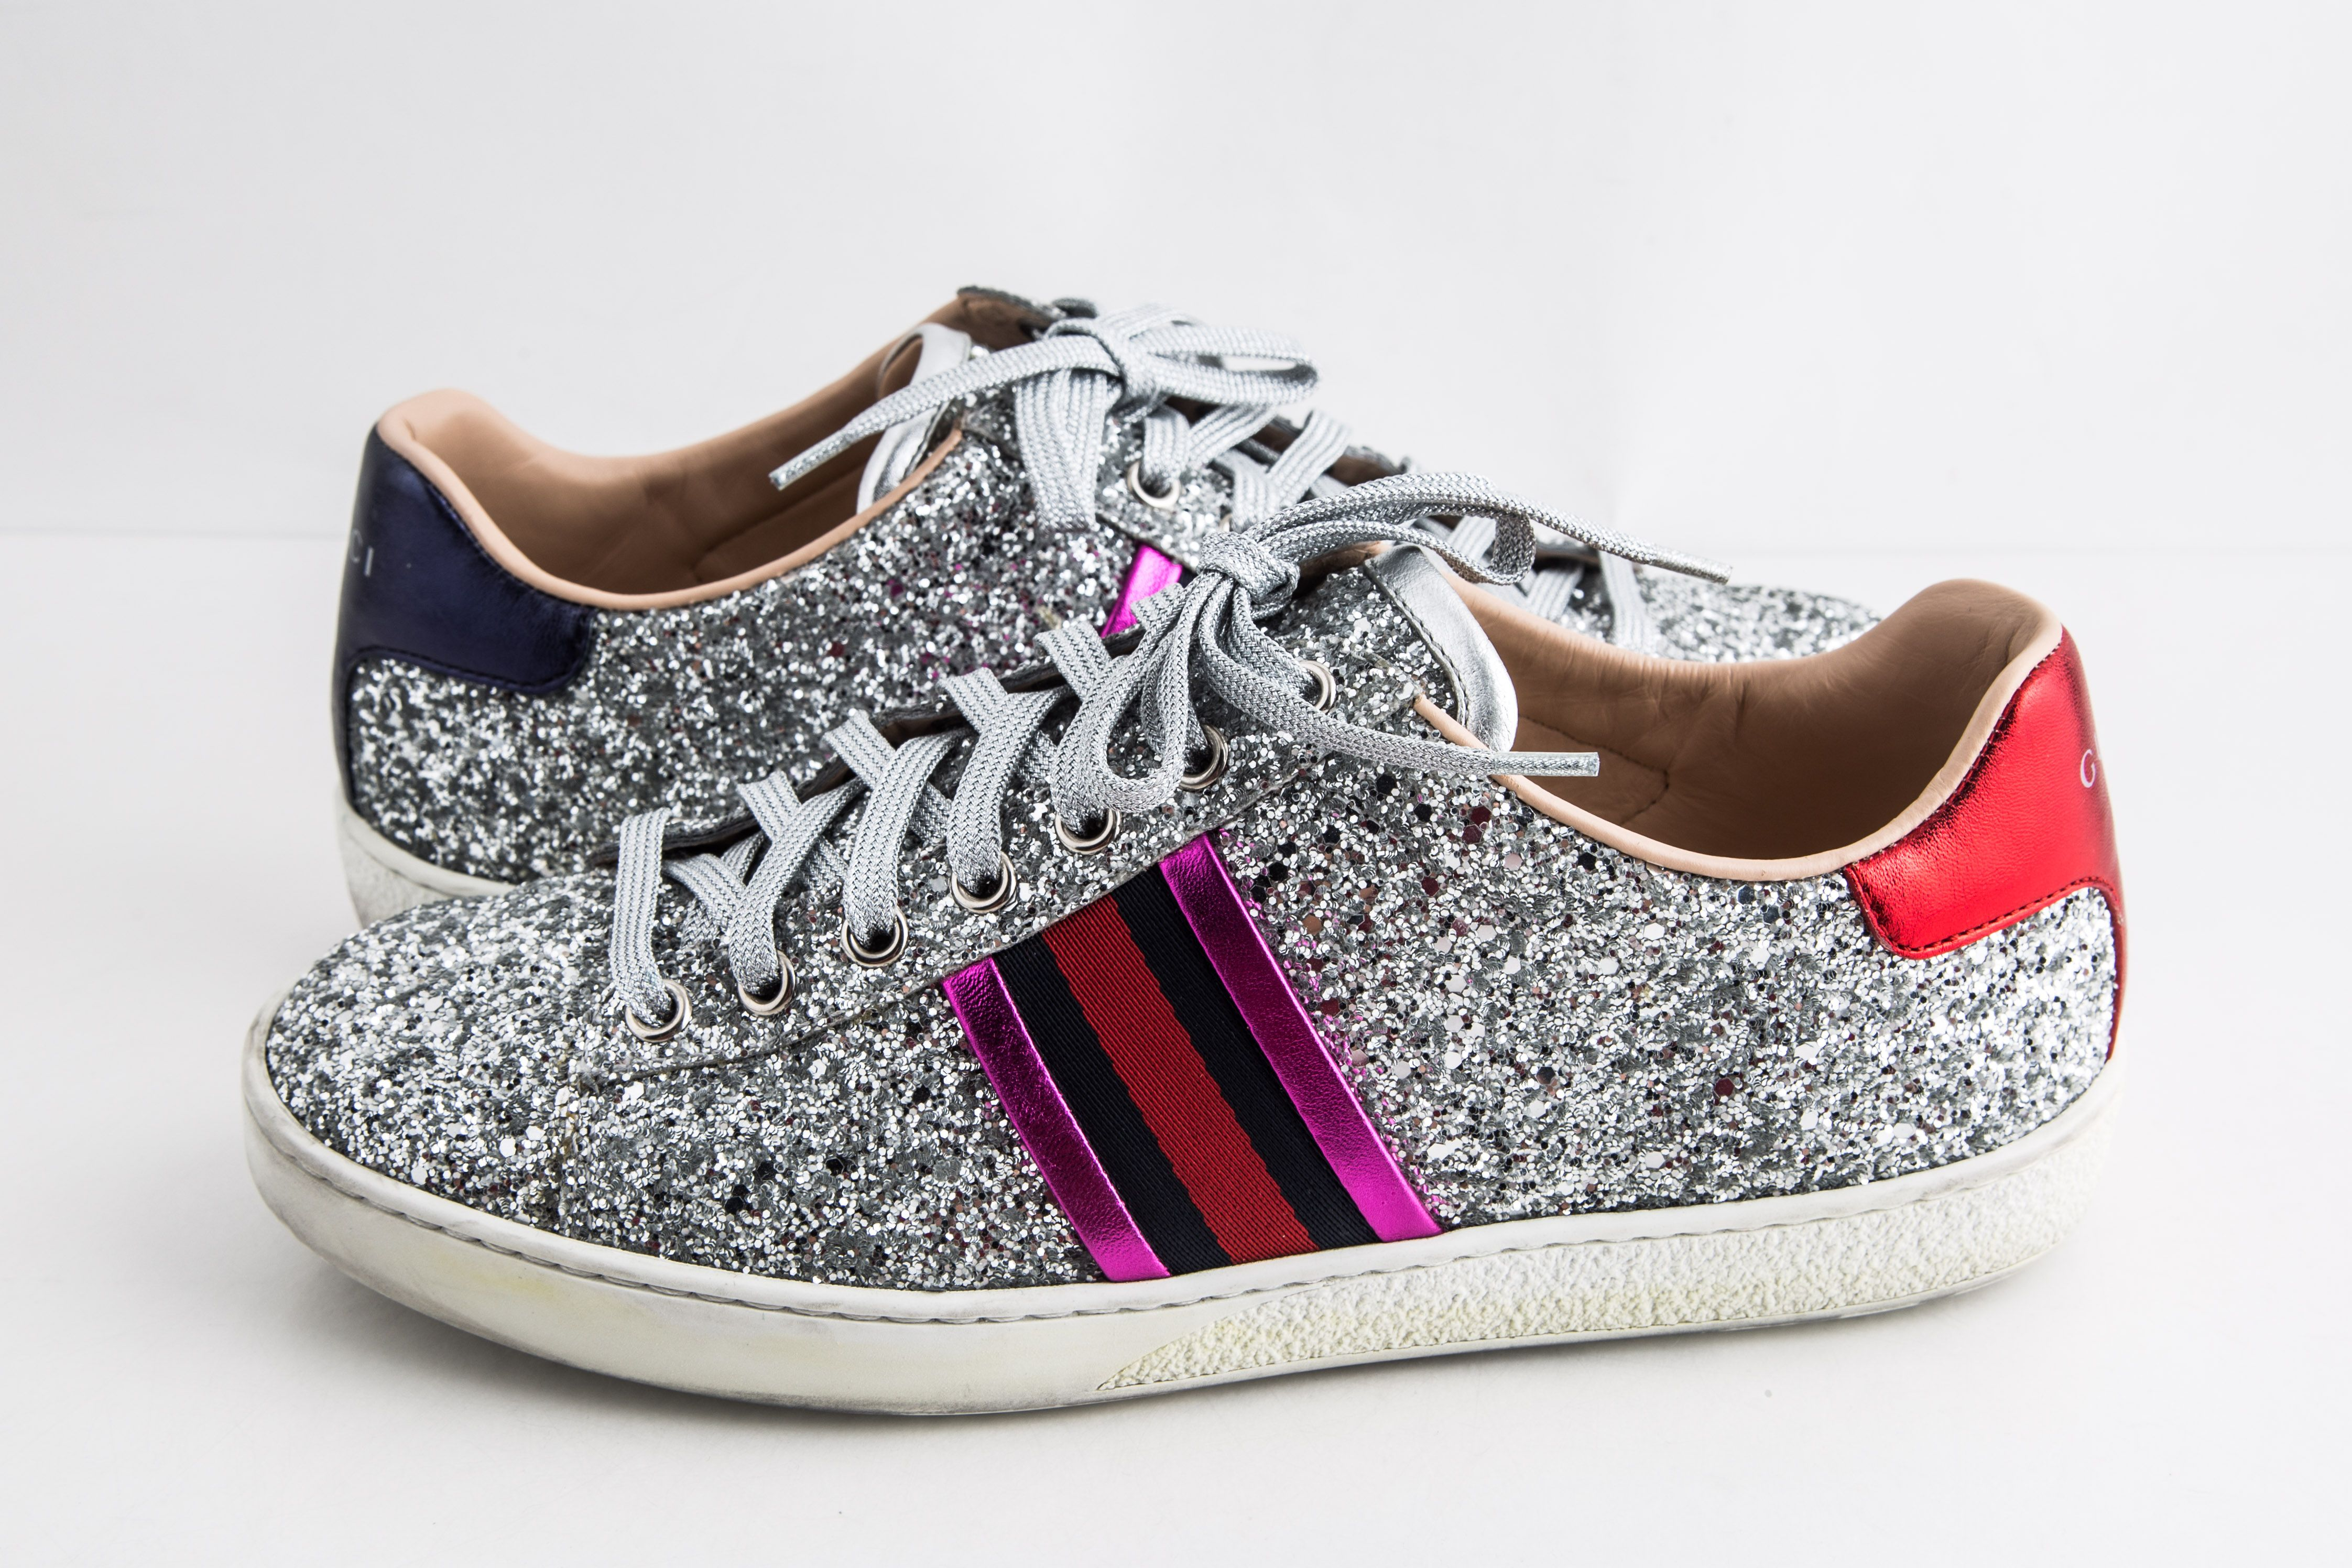 Gucci Ace Glitter Sneakers | LePrix